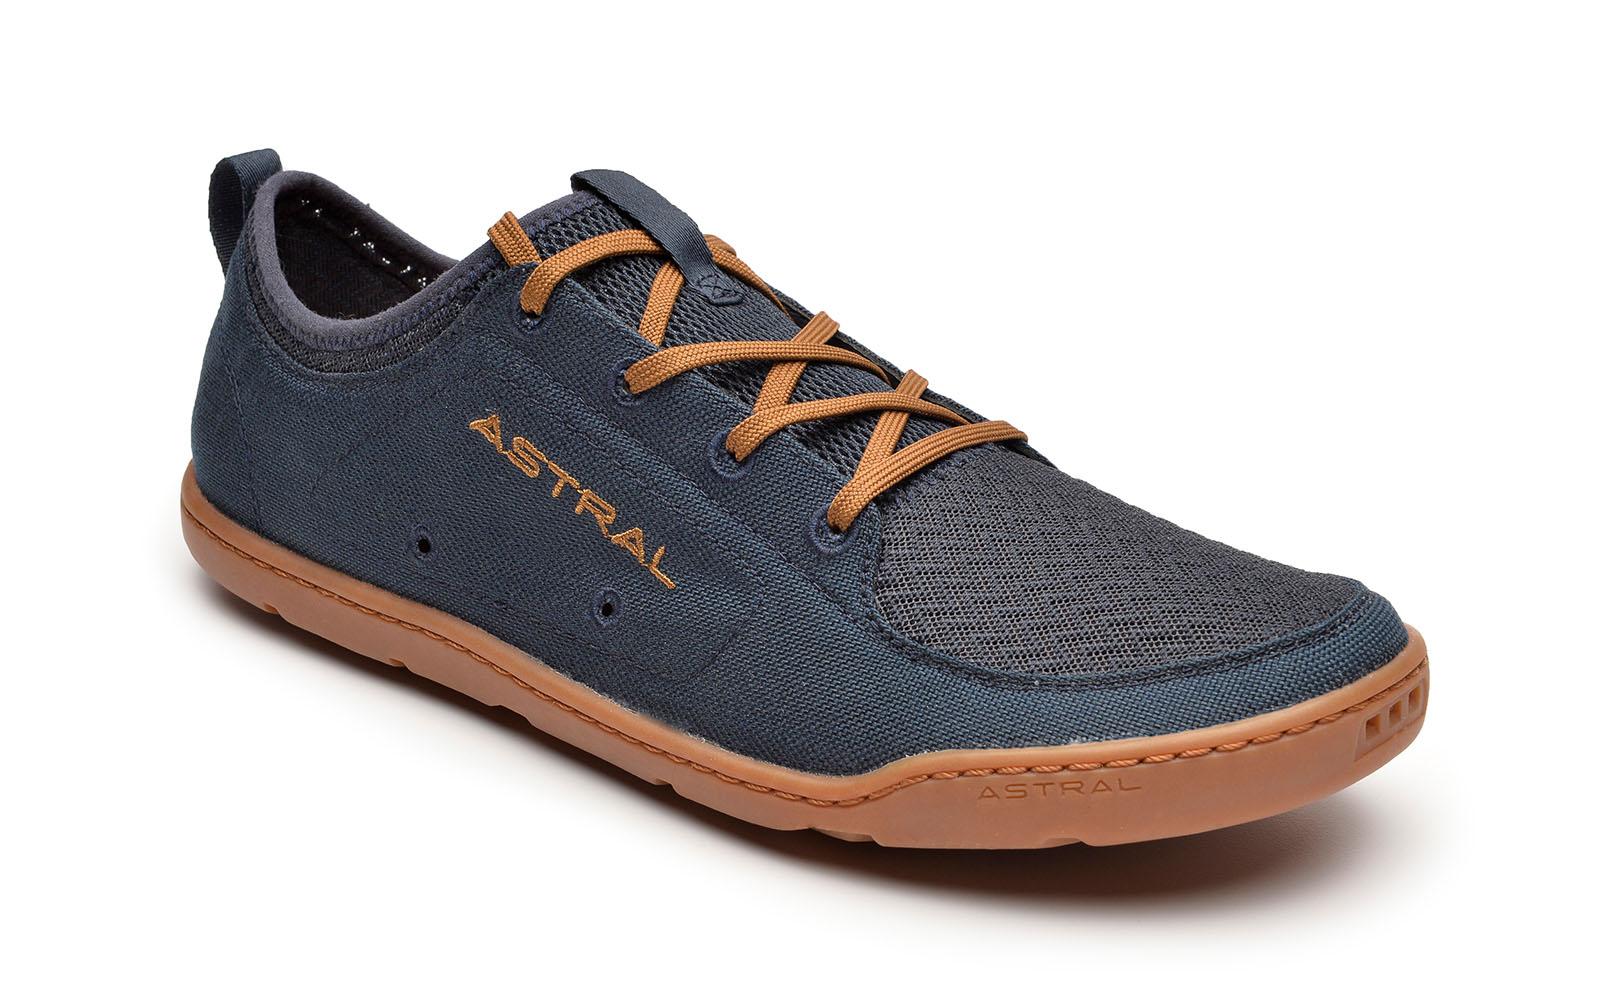 Loyak Men's Water Shoes | Astral